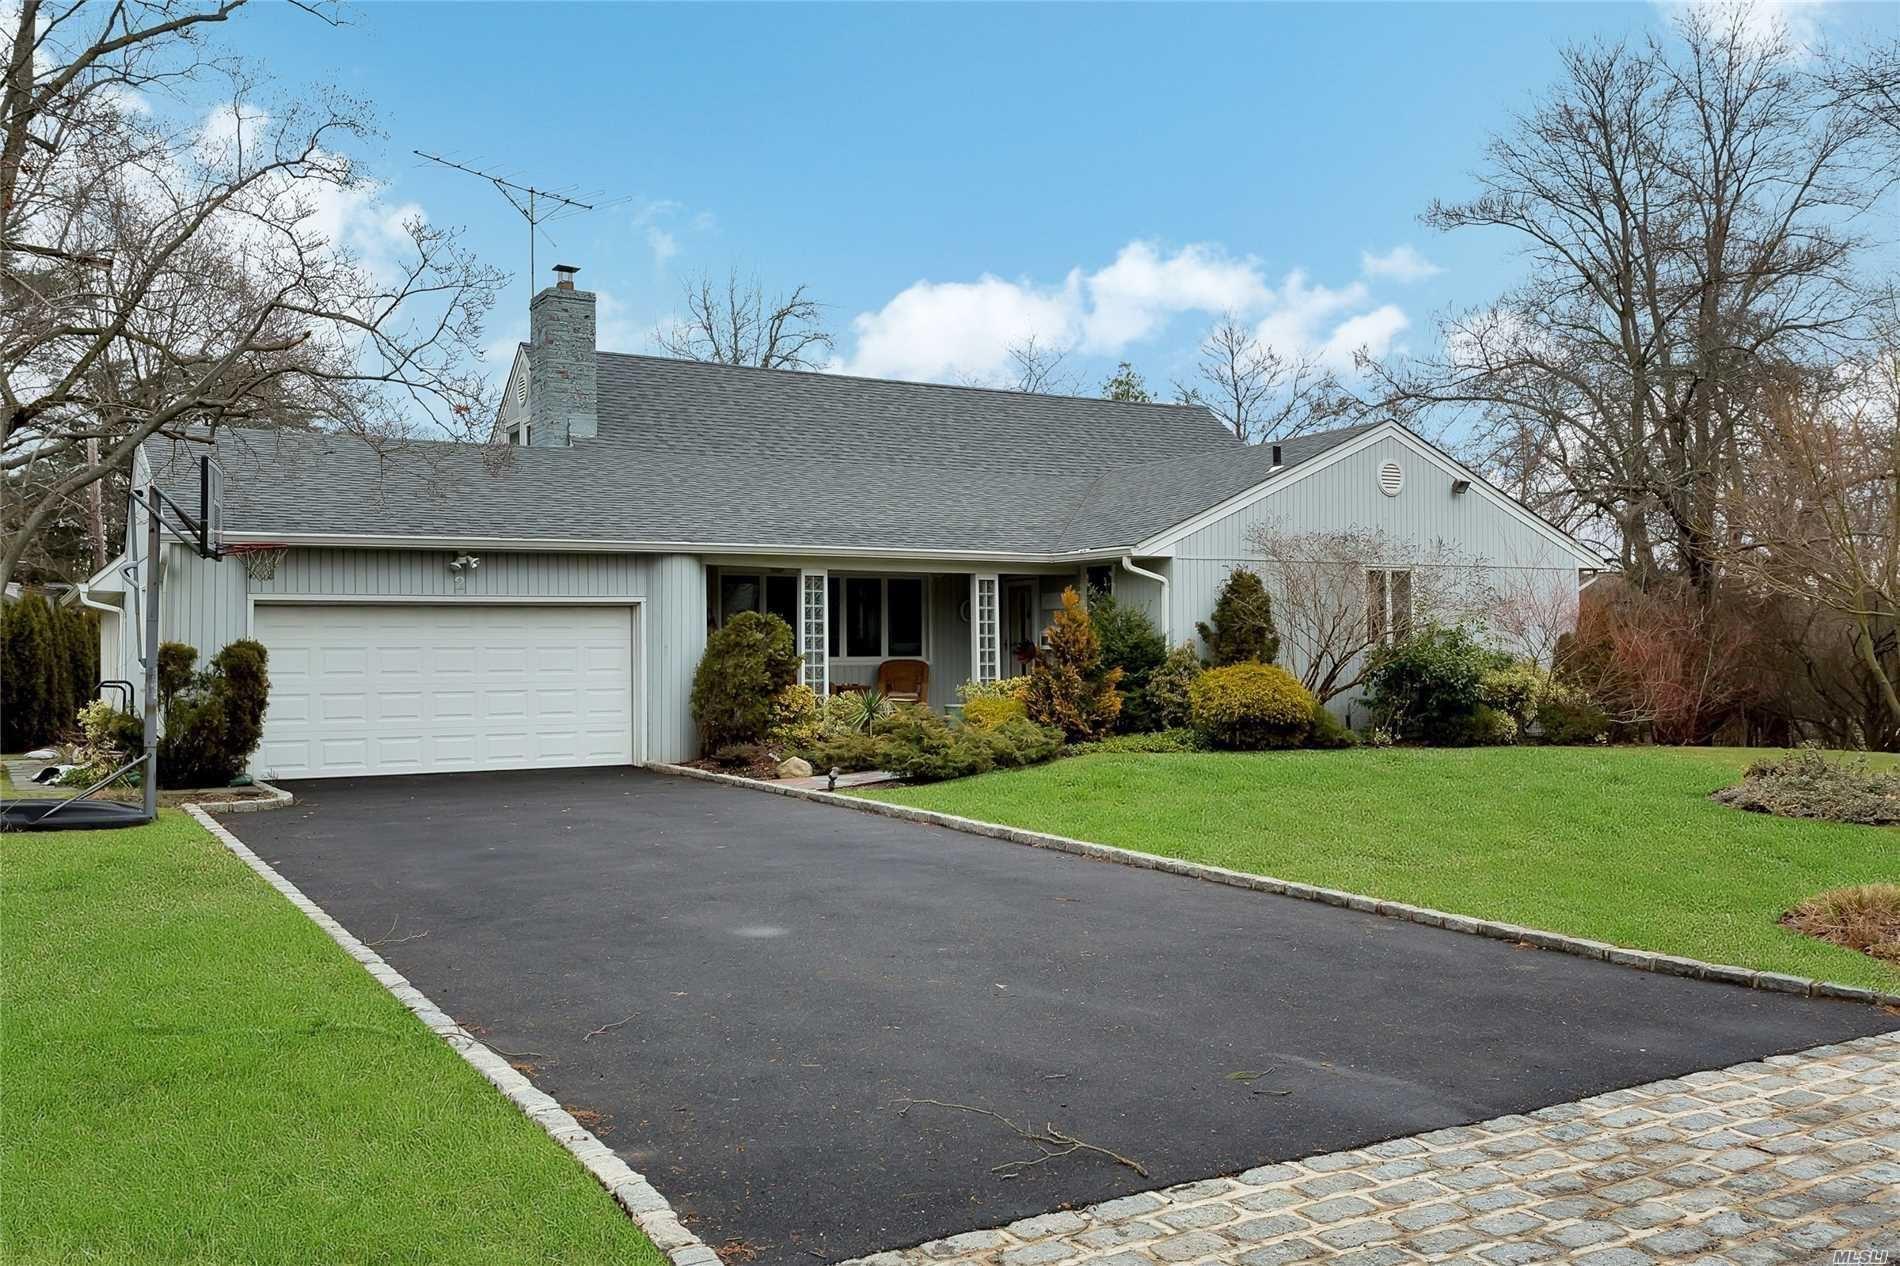 2 Pool Drive, Roslyn, NY 11576 - MLS#: 3194251